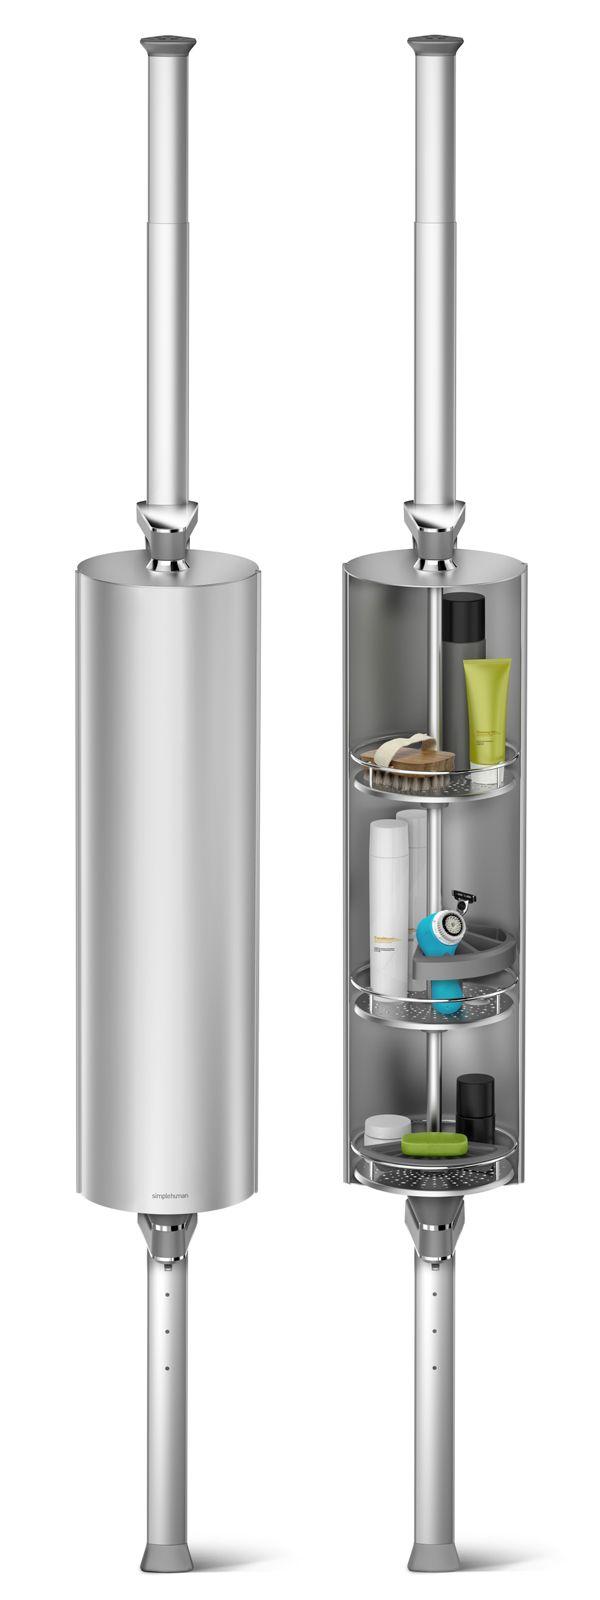 top 25 best modern shower caddies ideas on pinterest small introducing the all new aluminum spin cabinet an elegant and modern shower upgrade modern showershower caddiesspinbathroom